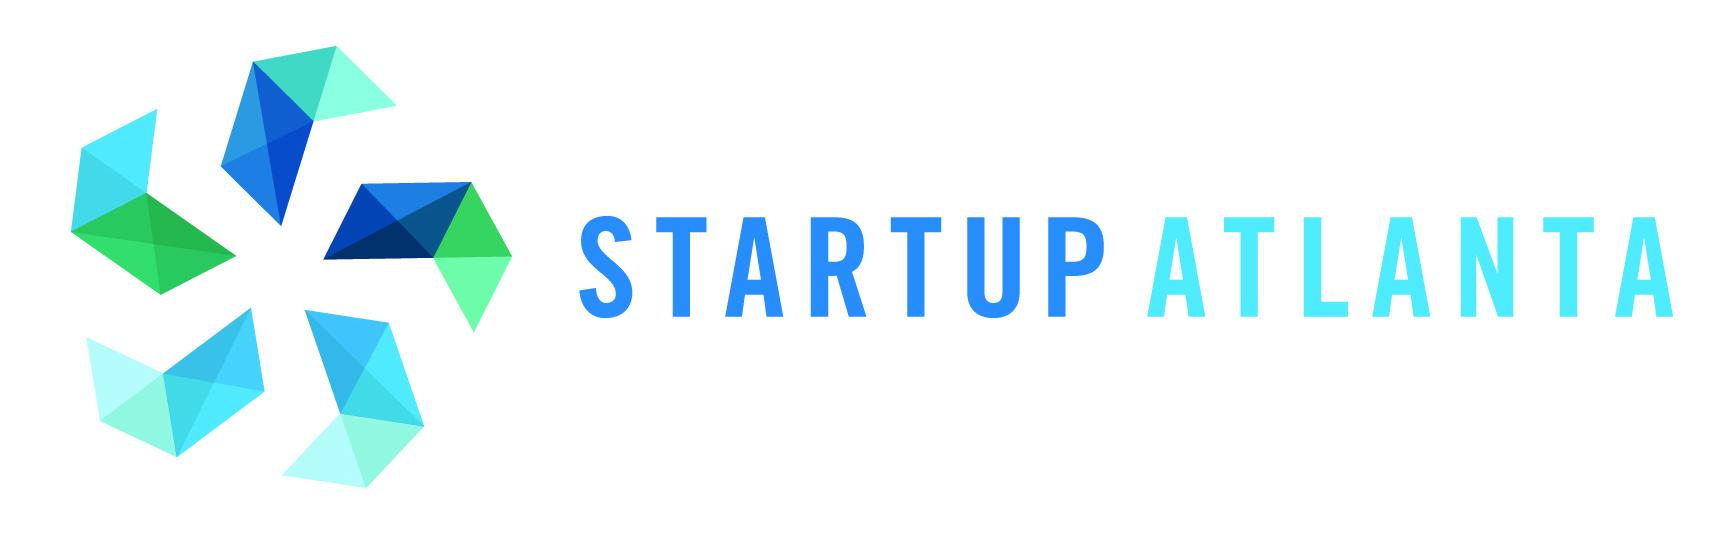 Startup Atlanta logo